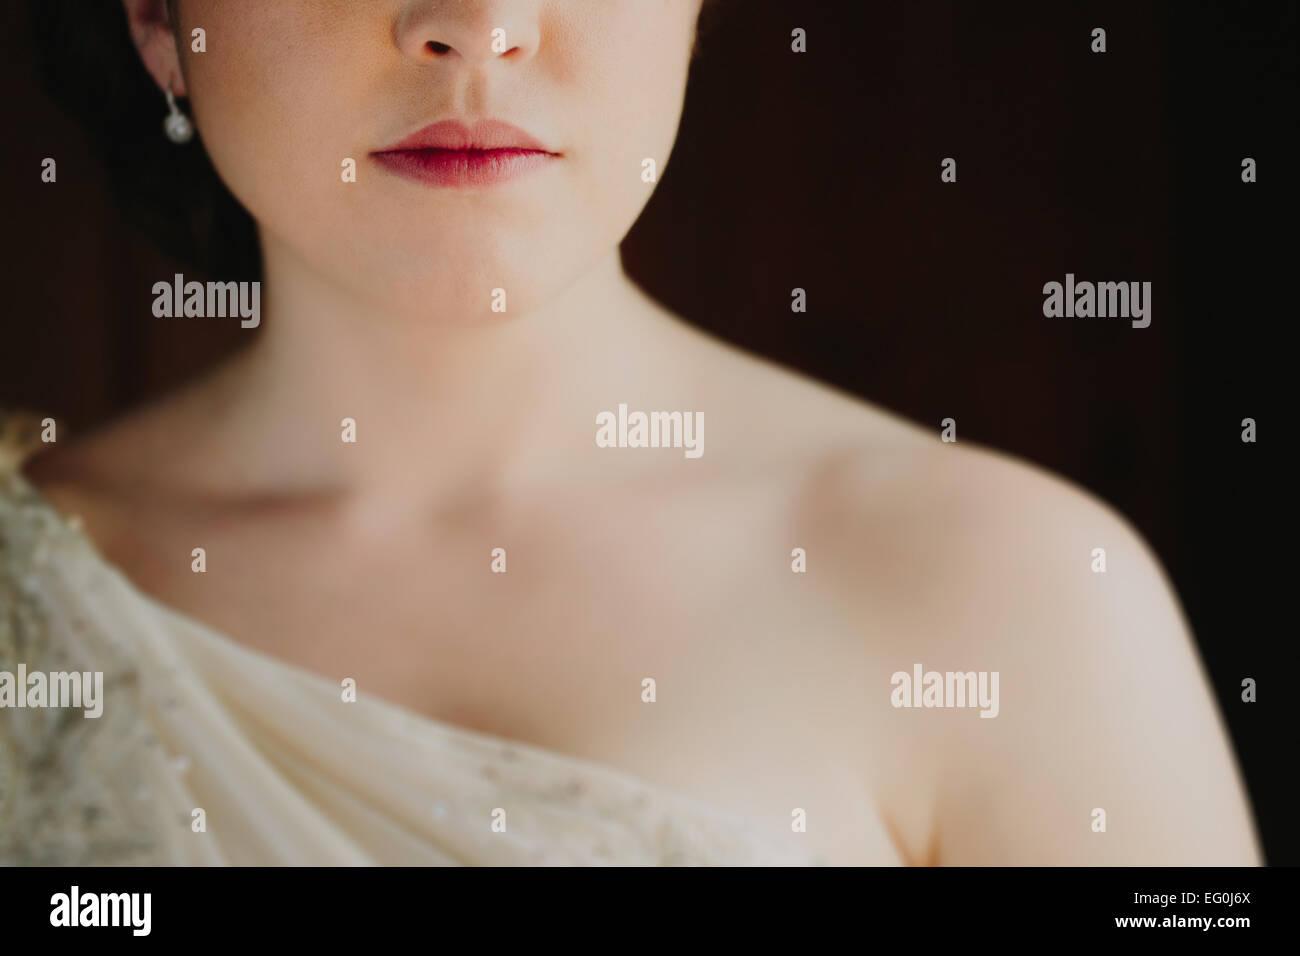 Nahaufnahme von Frau im Hochzeitskleid Stockbild